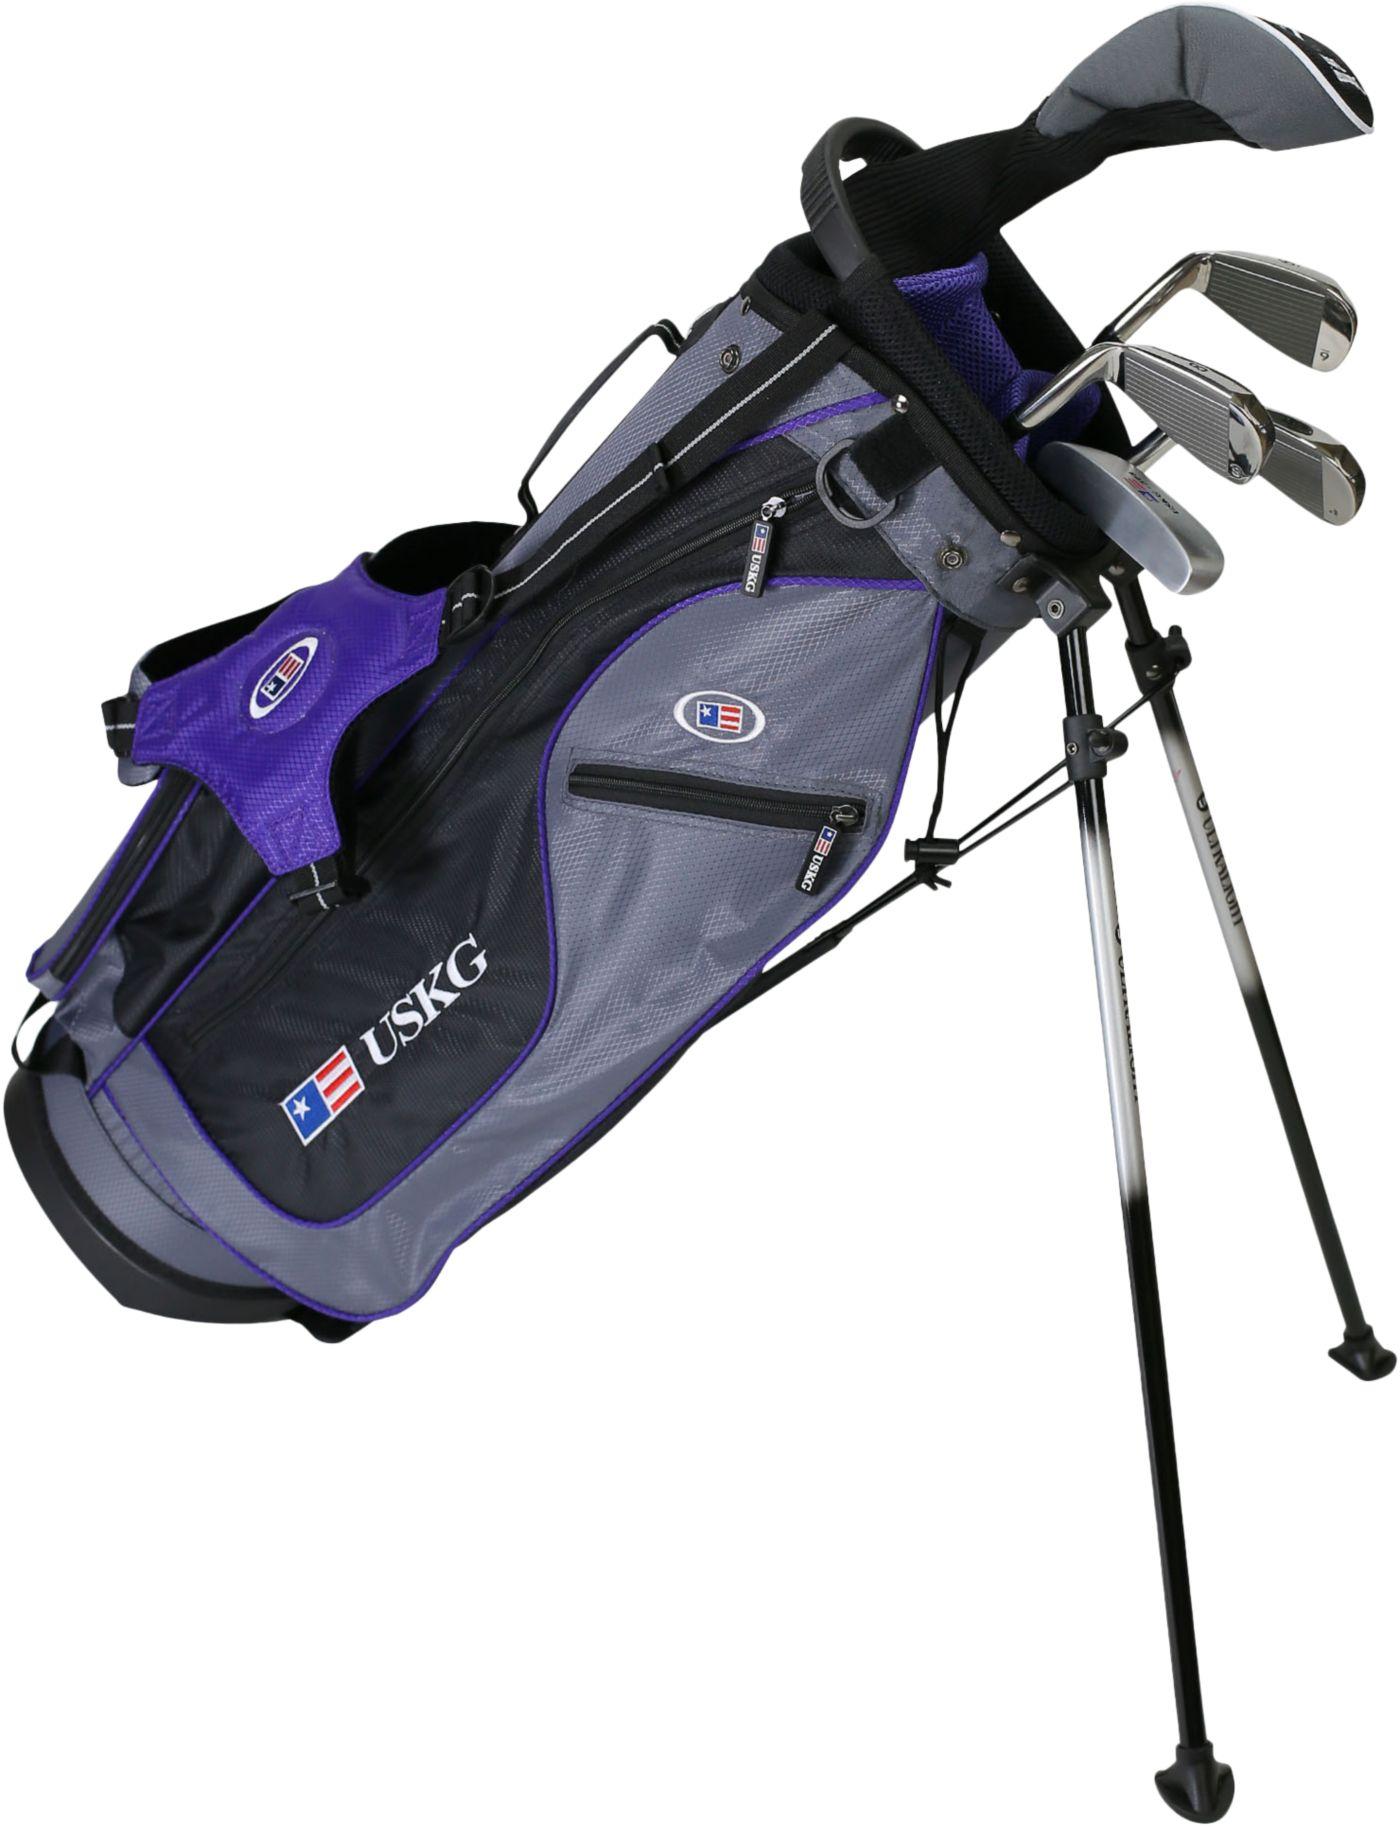 "U.S. Kids Golf Ultralight Complete Set (Height 54'' – 57"")"